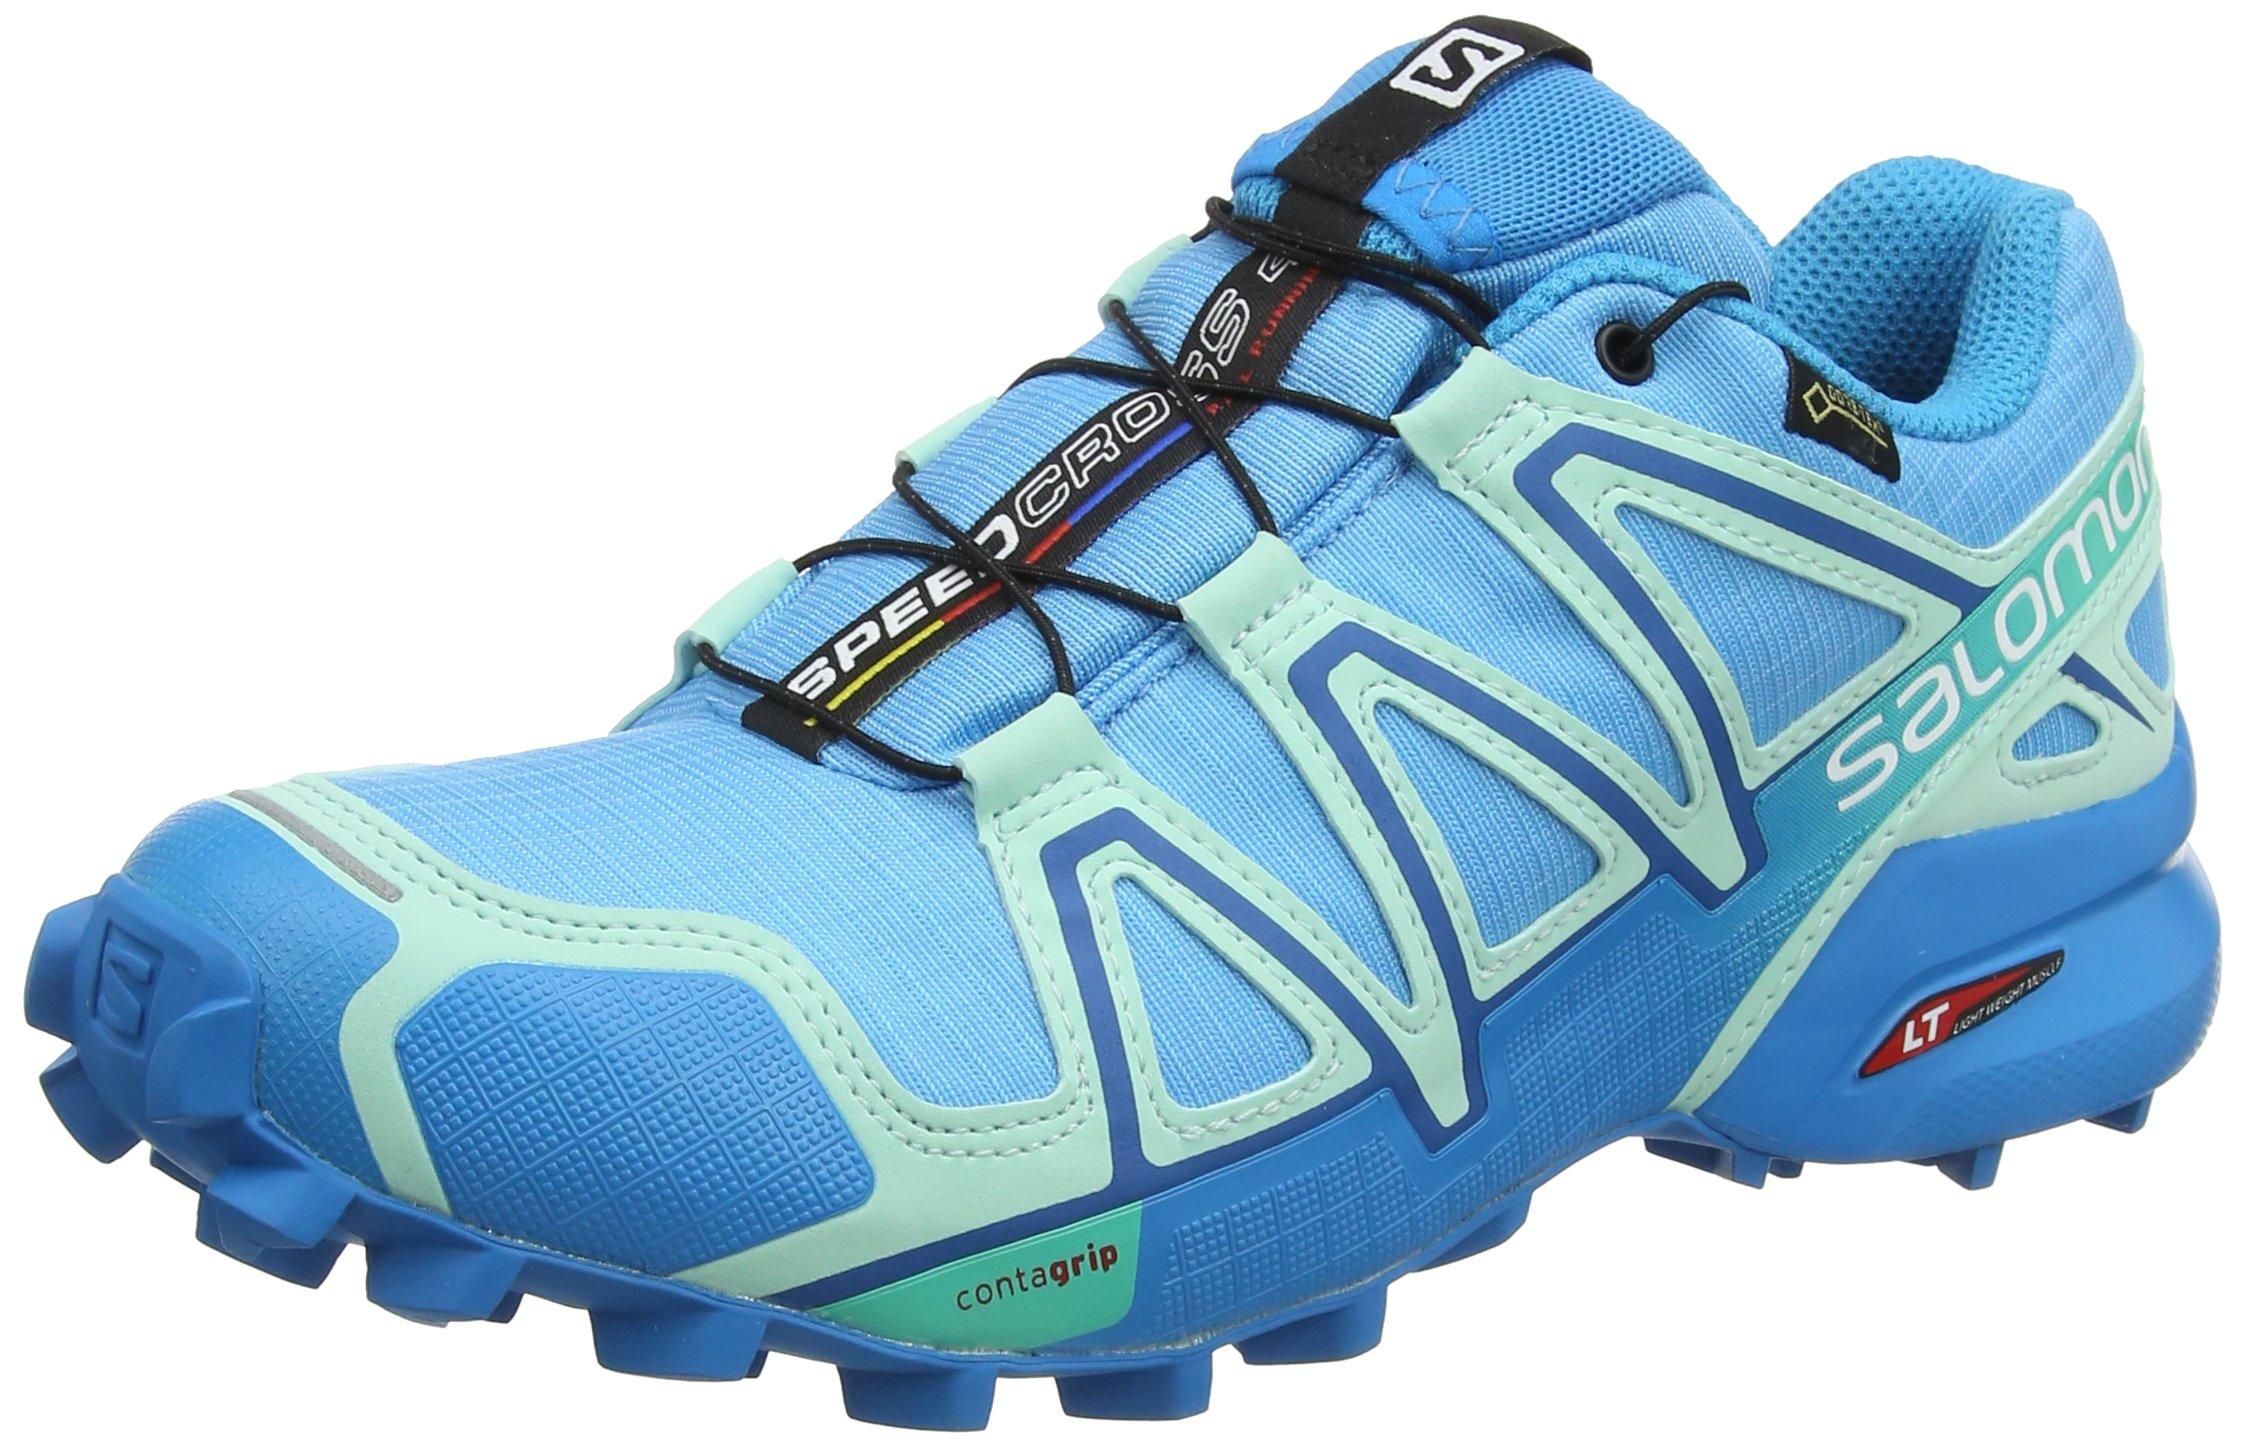 Salomon Speedcross 4 GTX W, Calzado de Trail Running para Mujer product image